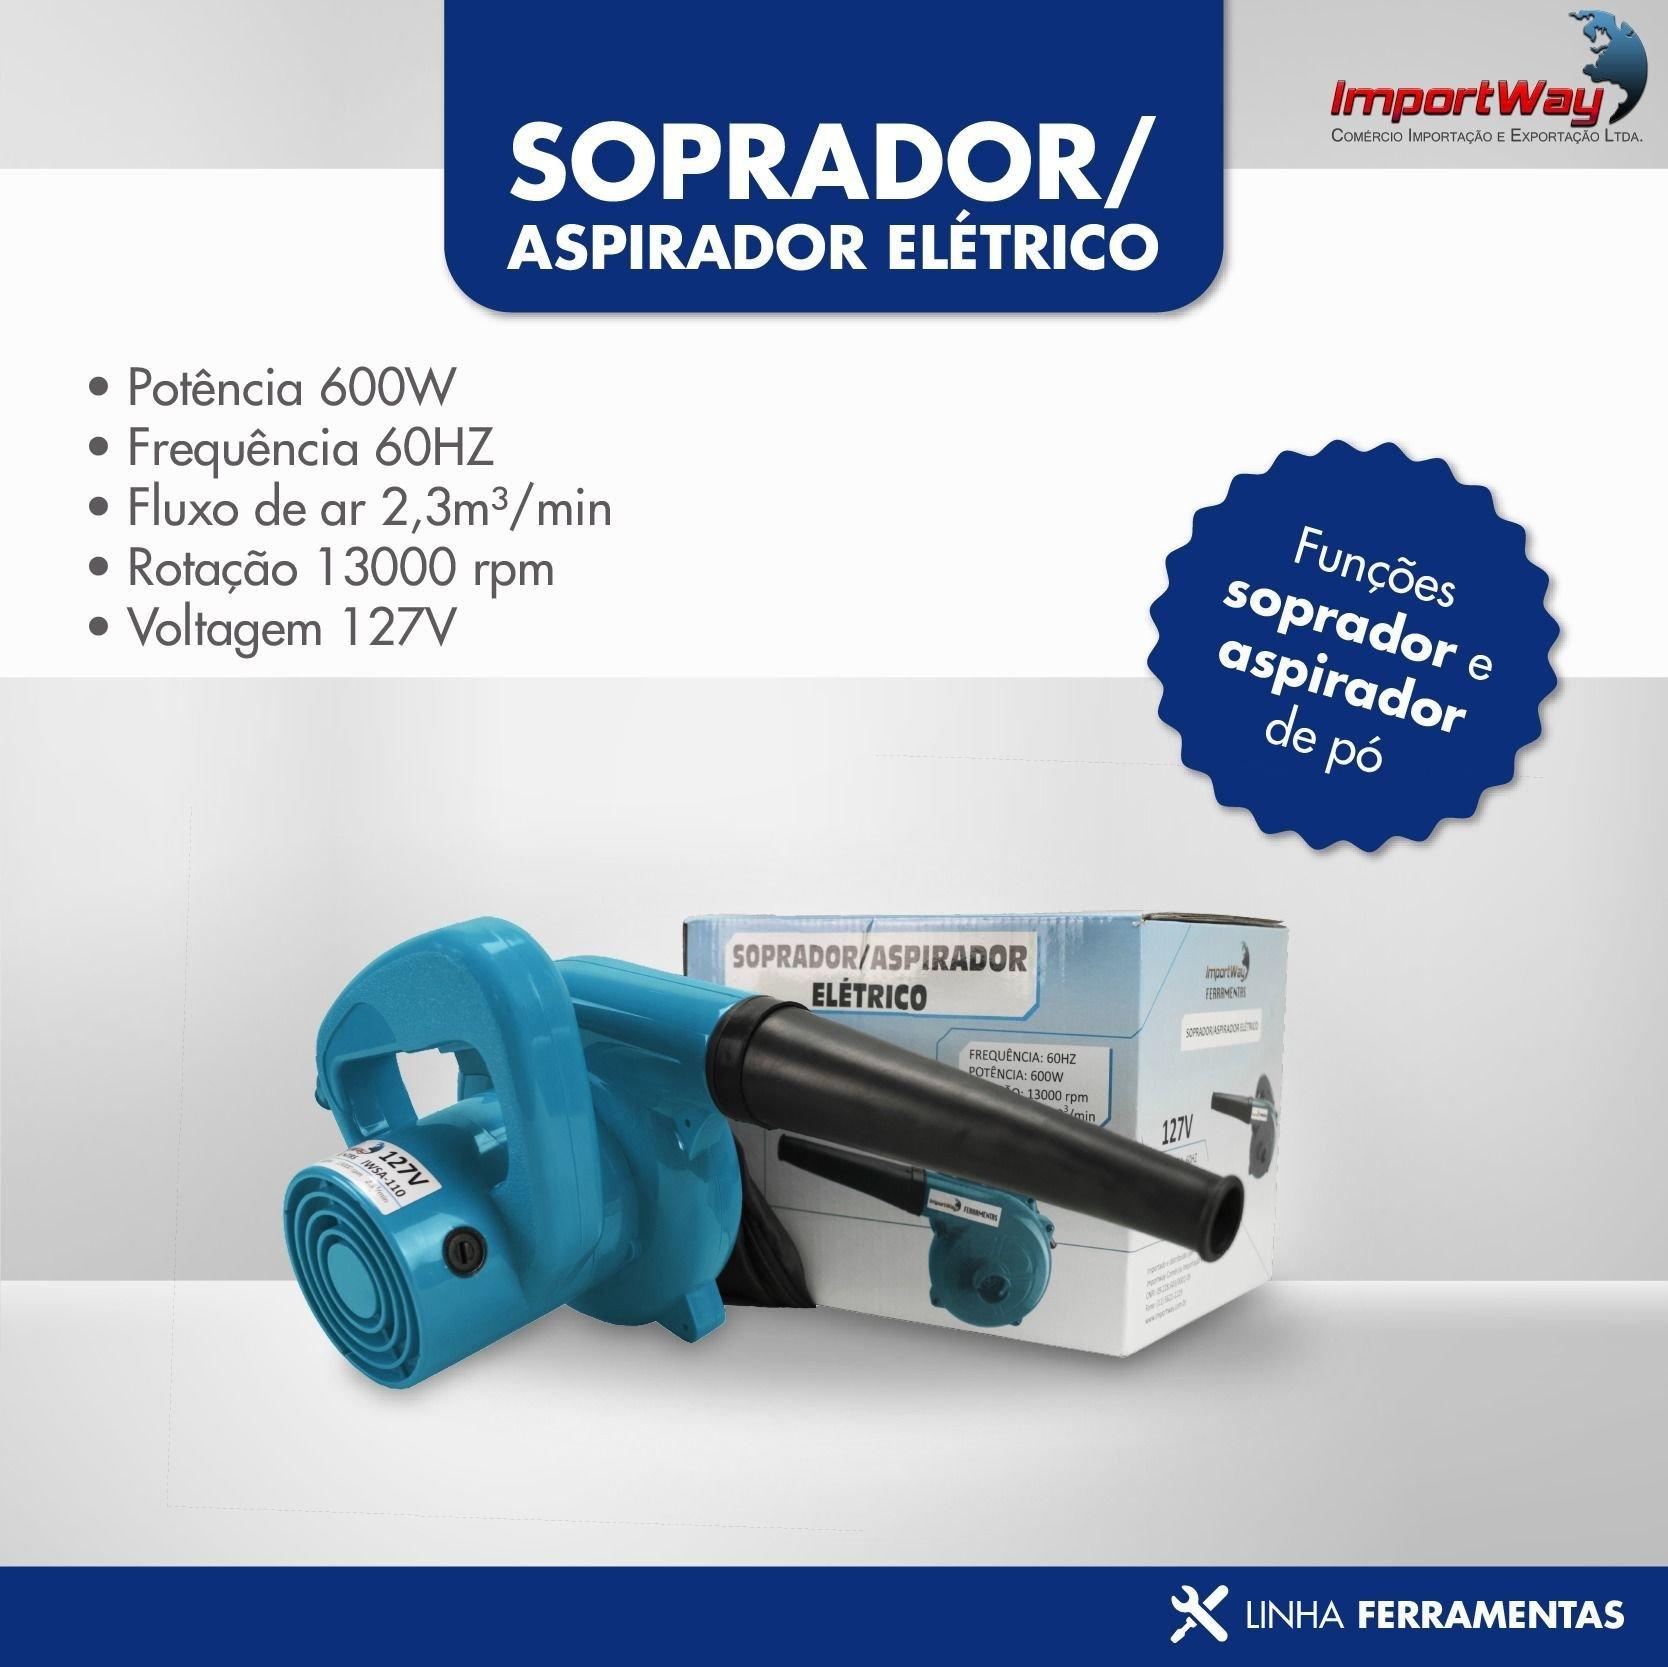 Soprador Aspirador Ar Pó 600w 127v - Importway